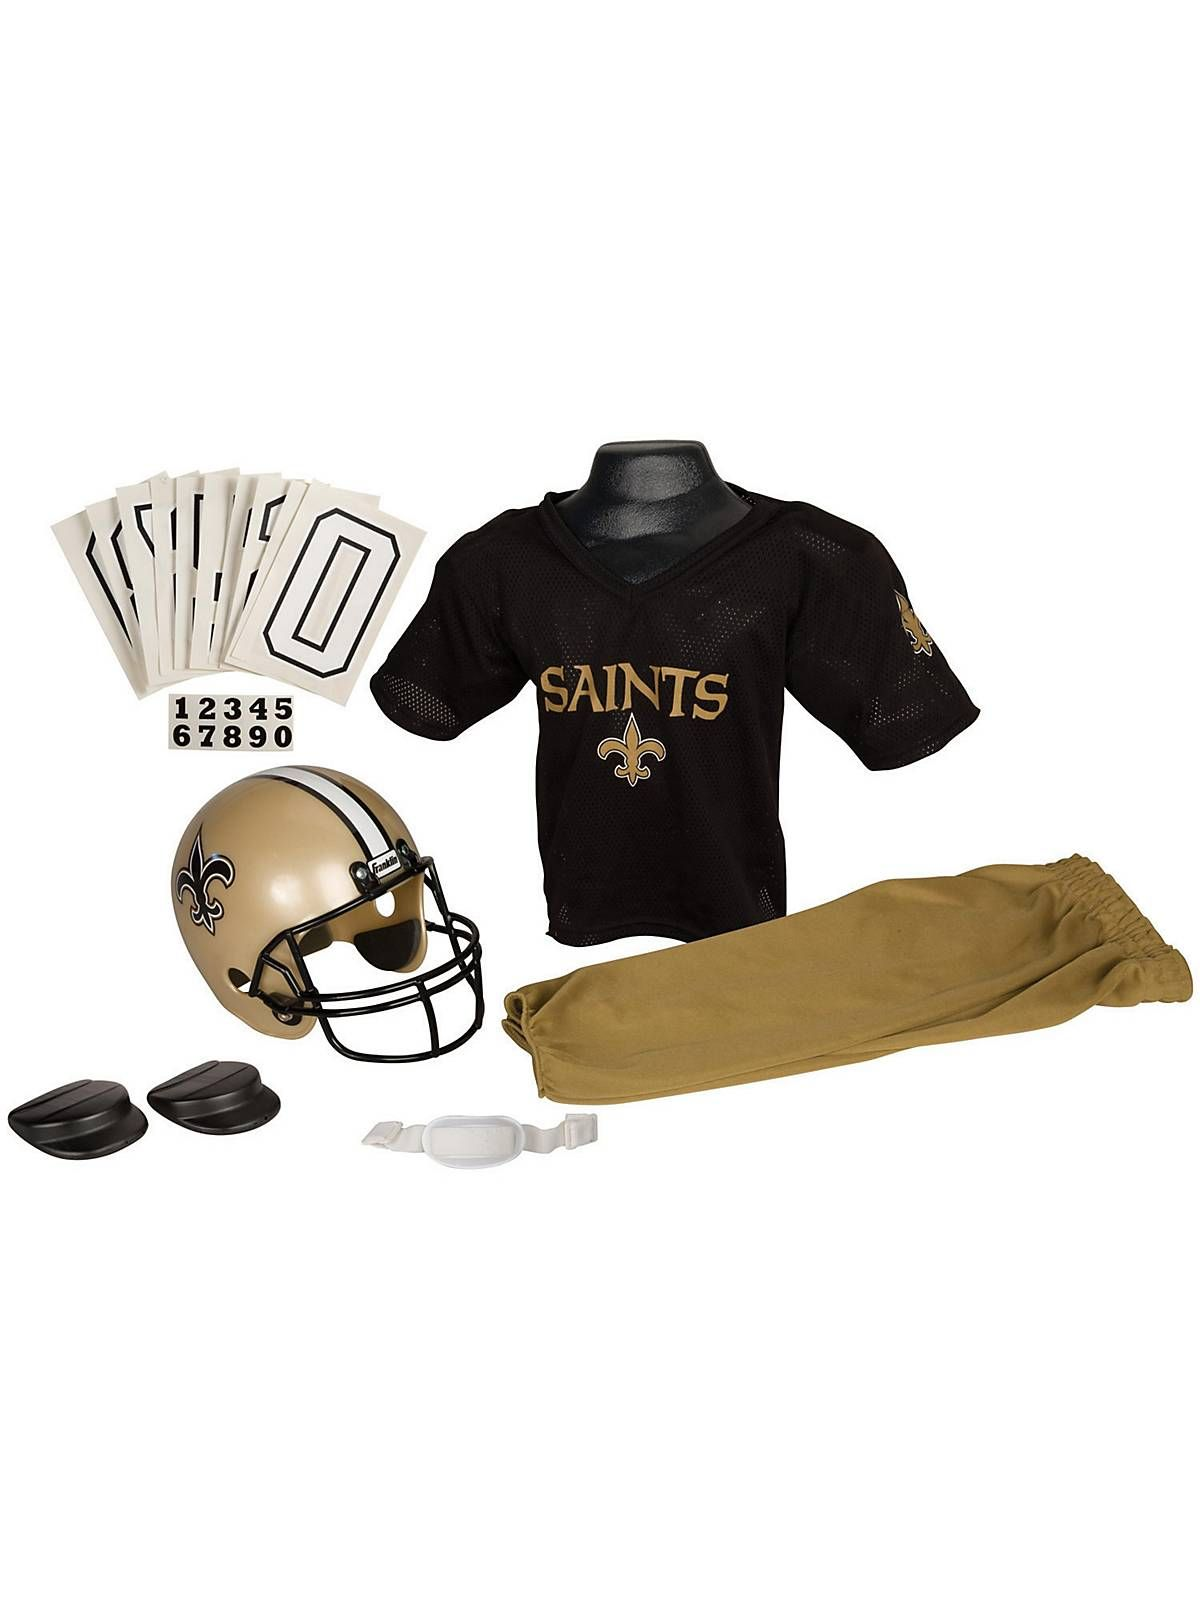 6866aee38 Childs NFL Saints Helmet and Uniform Set! See more football  costume  accessories at CostumeSuperCenter.com